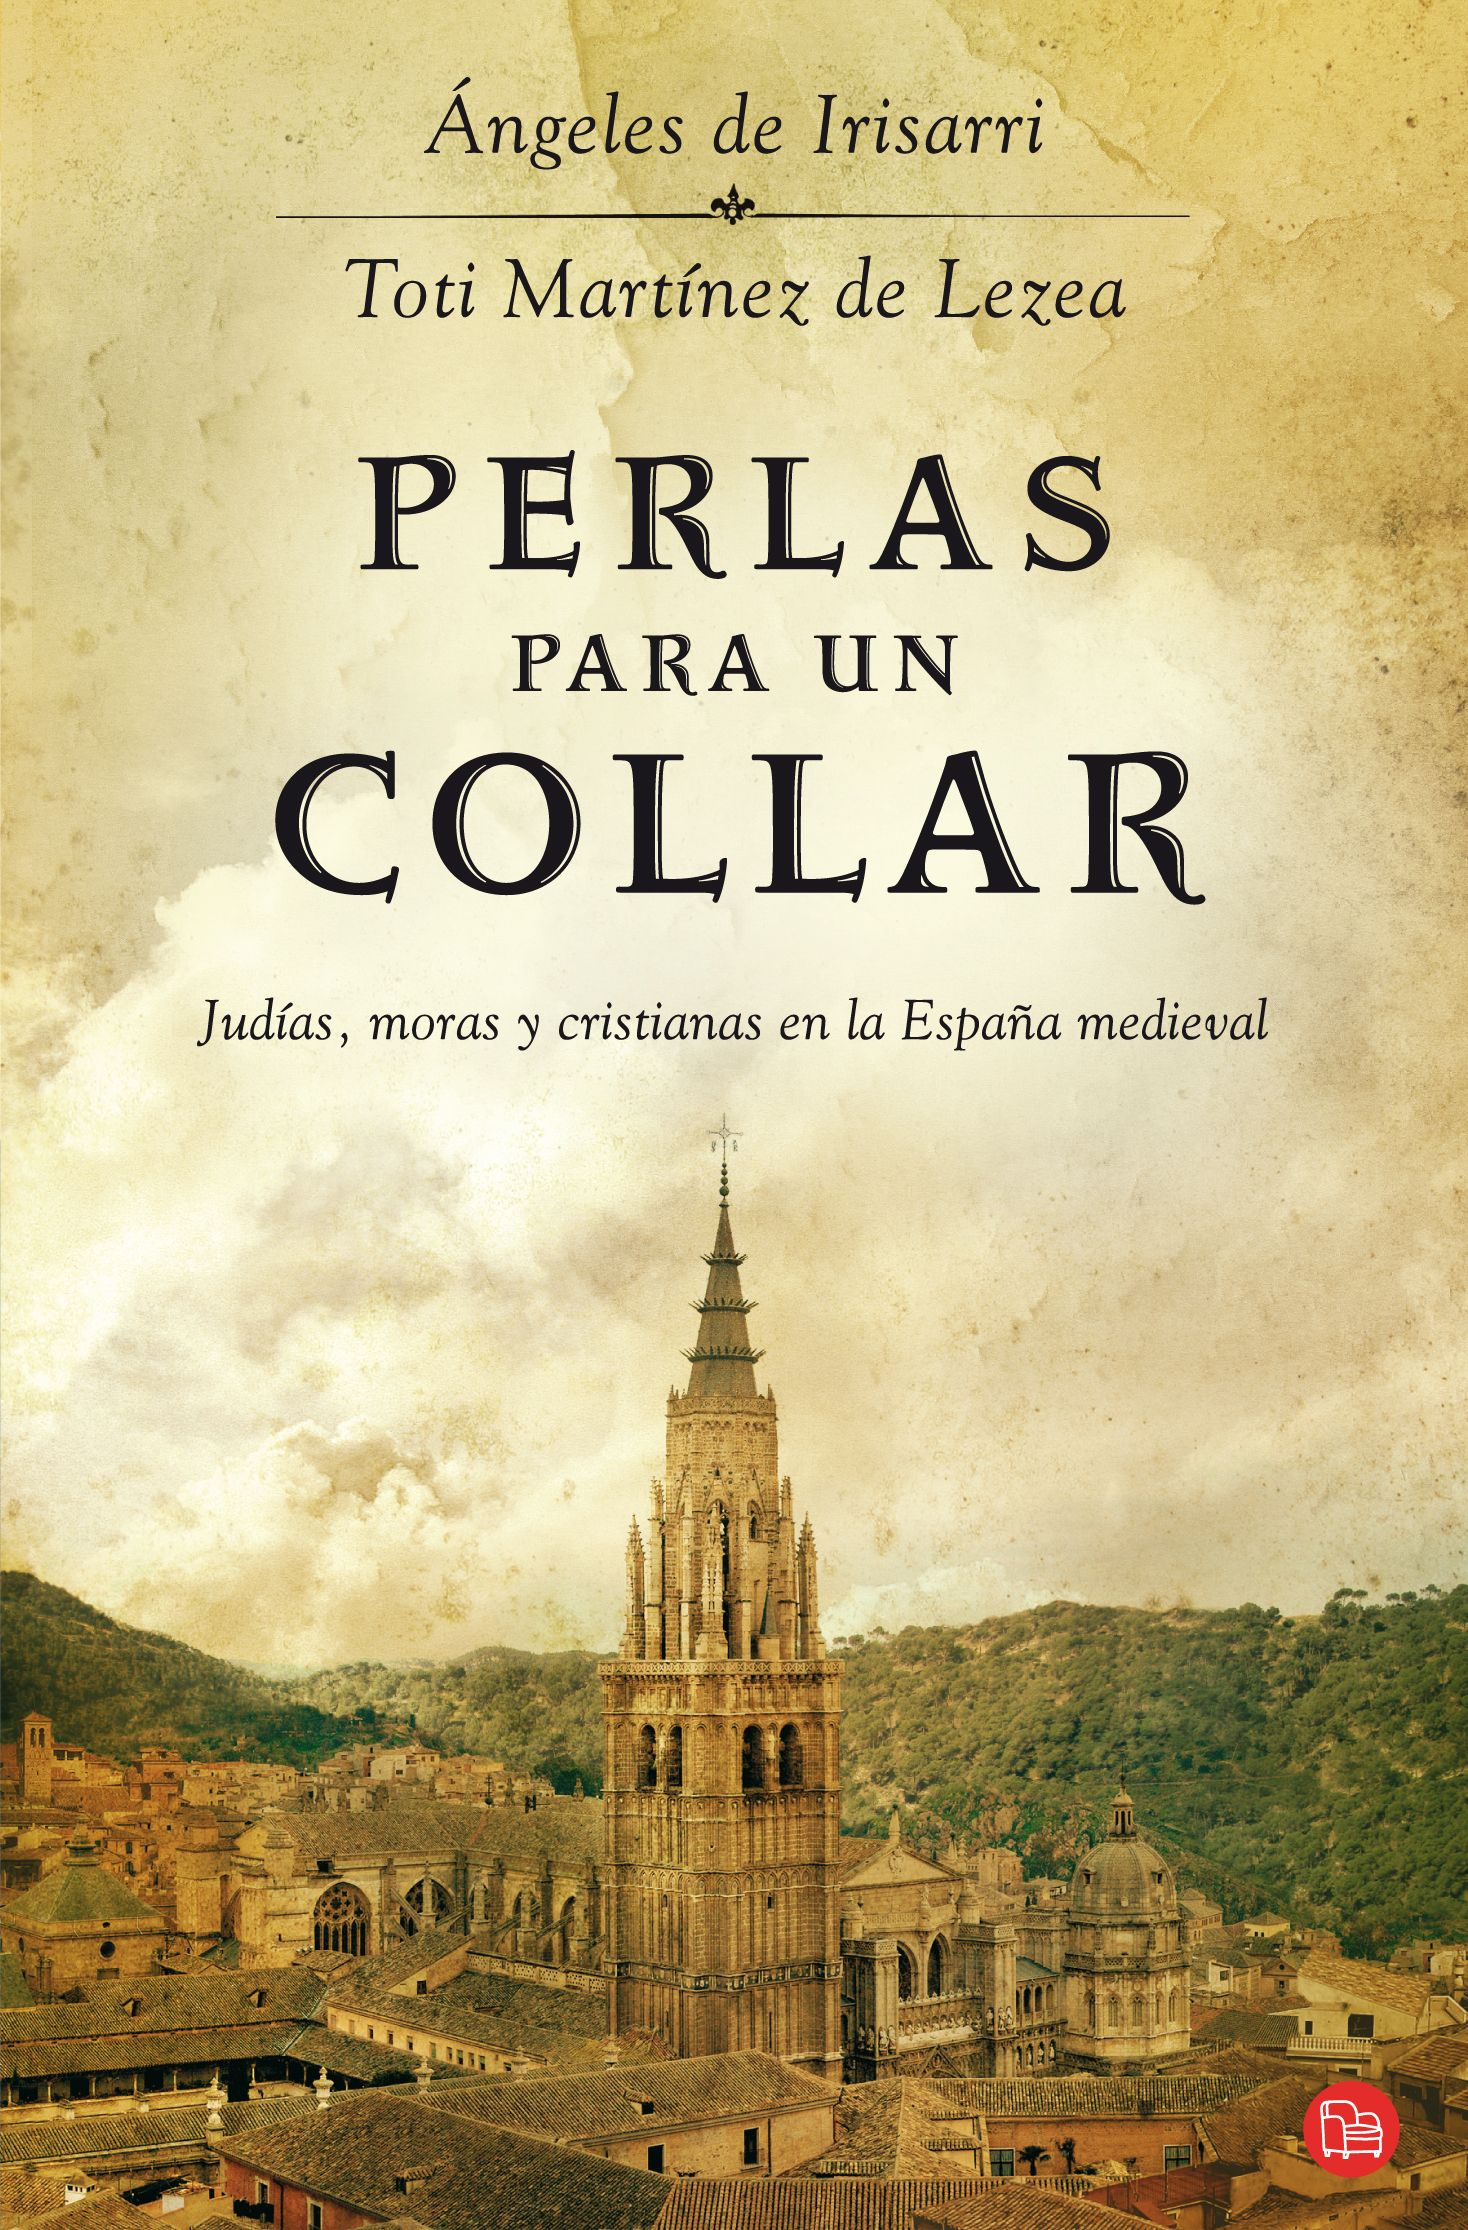 Perlas Para Un Collar Libros En Espanol Libros Libros Romanticos Recomendados